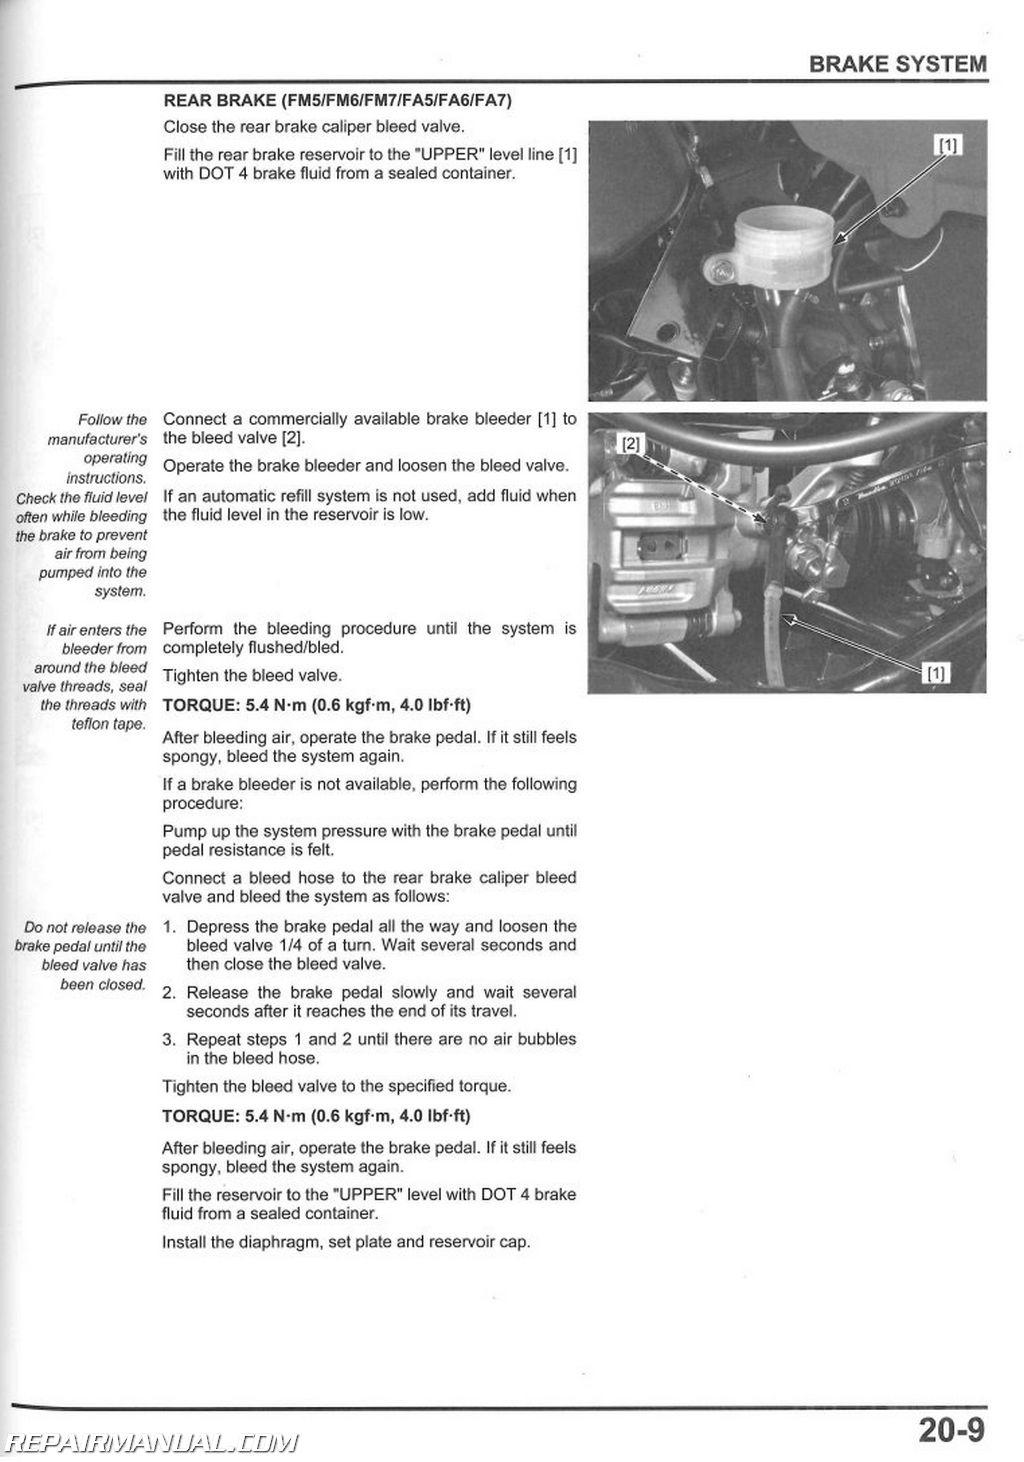 hight resolution of trx500fe atv wiring diagram for dummy